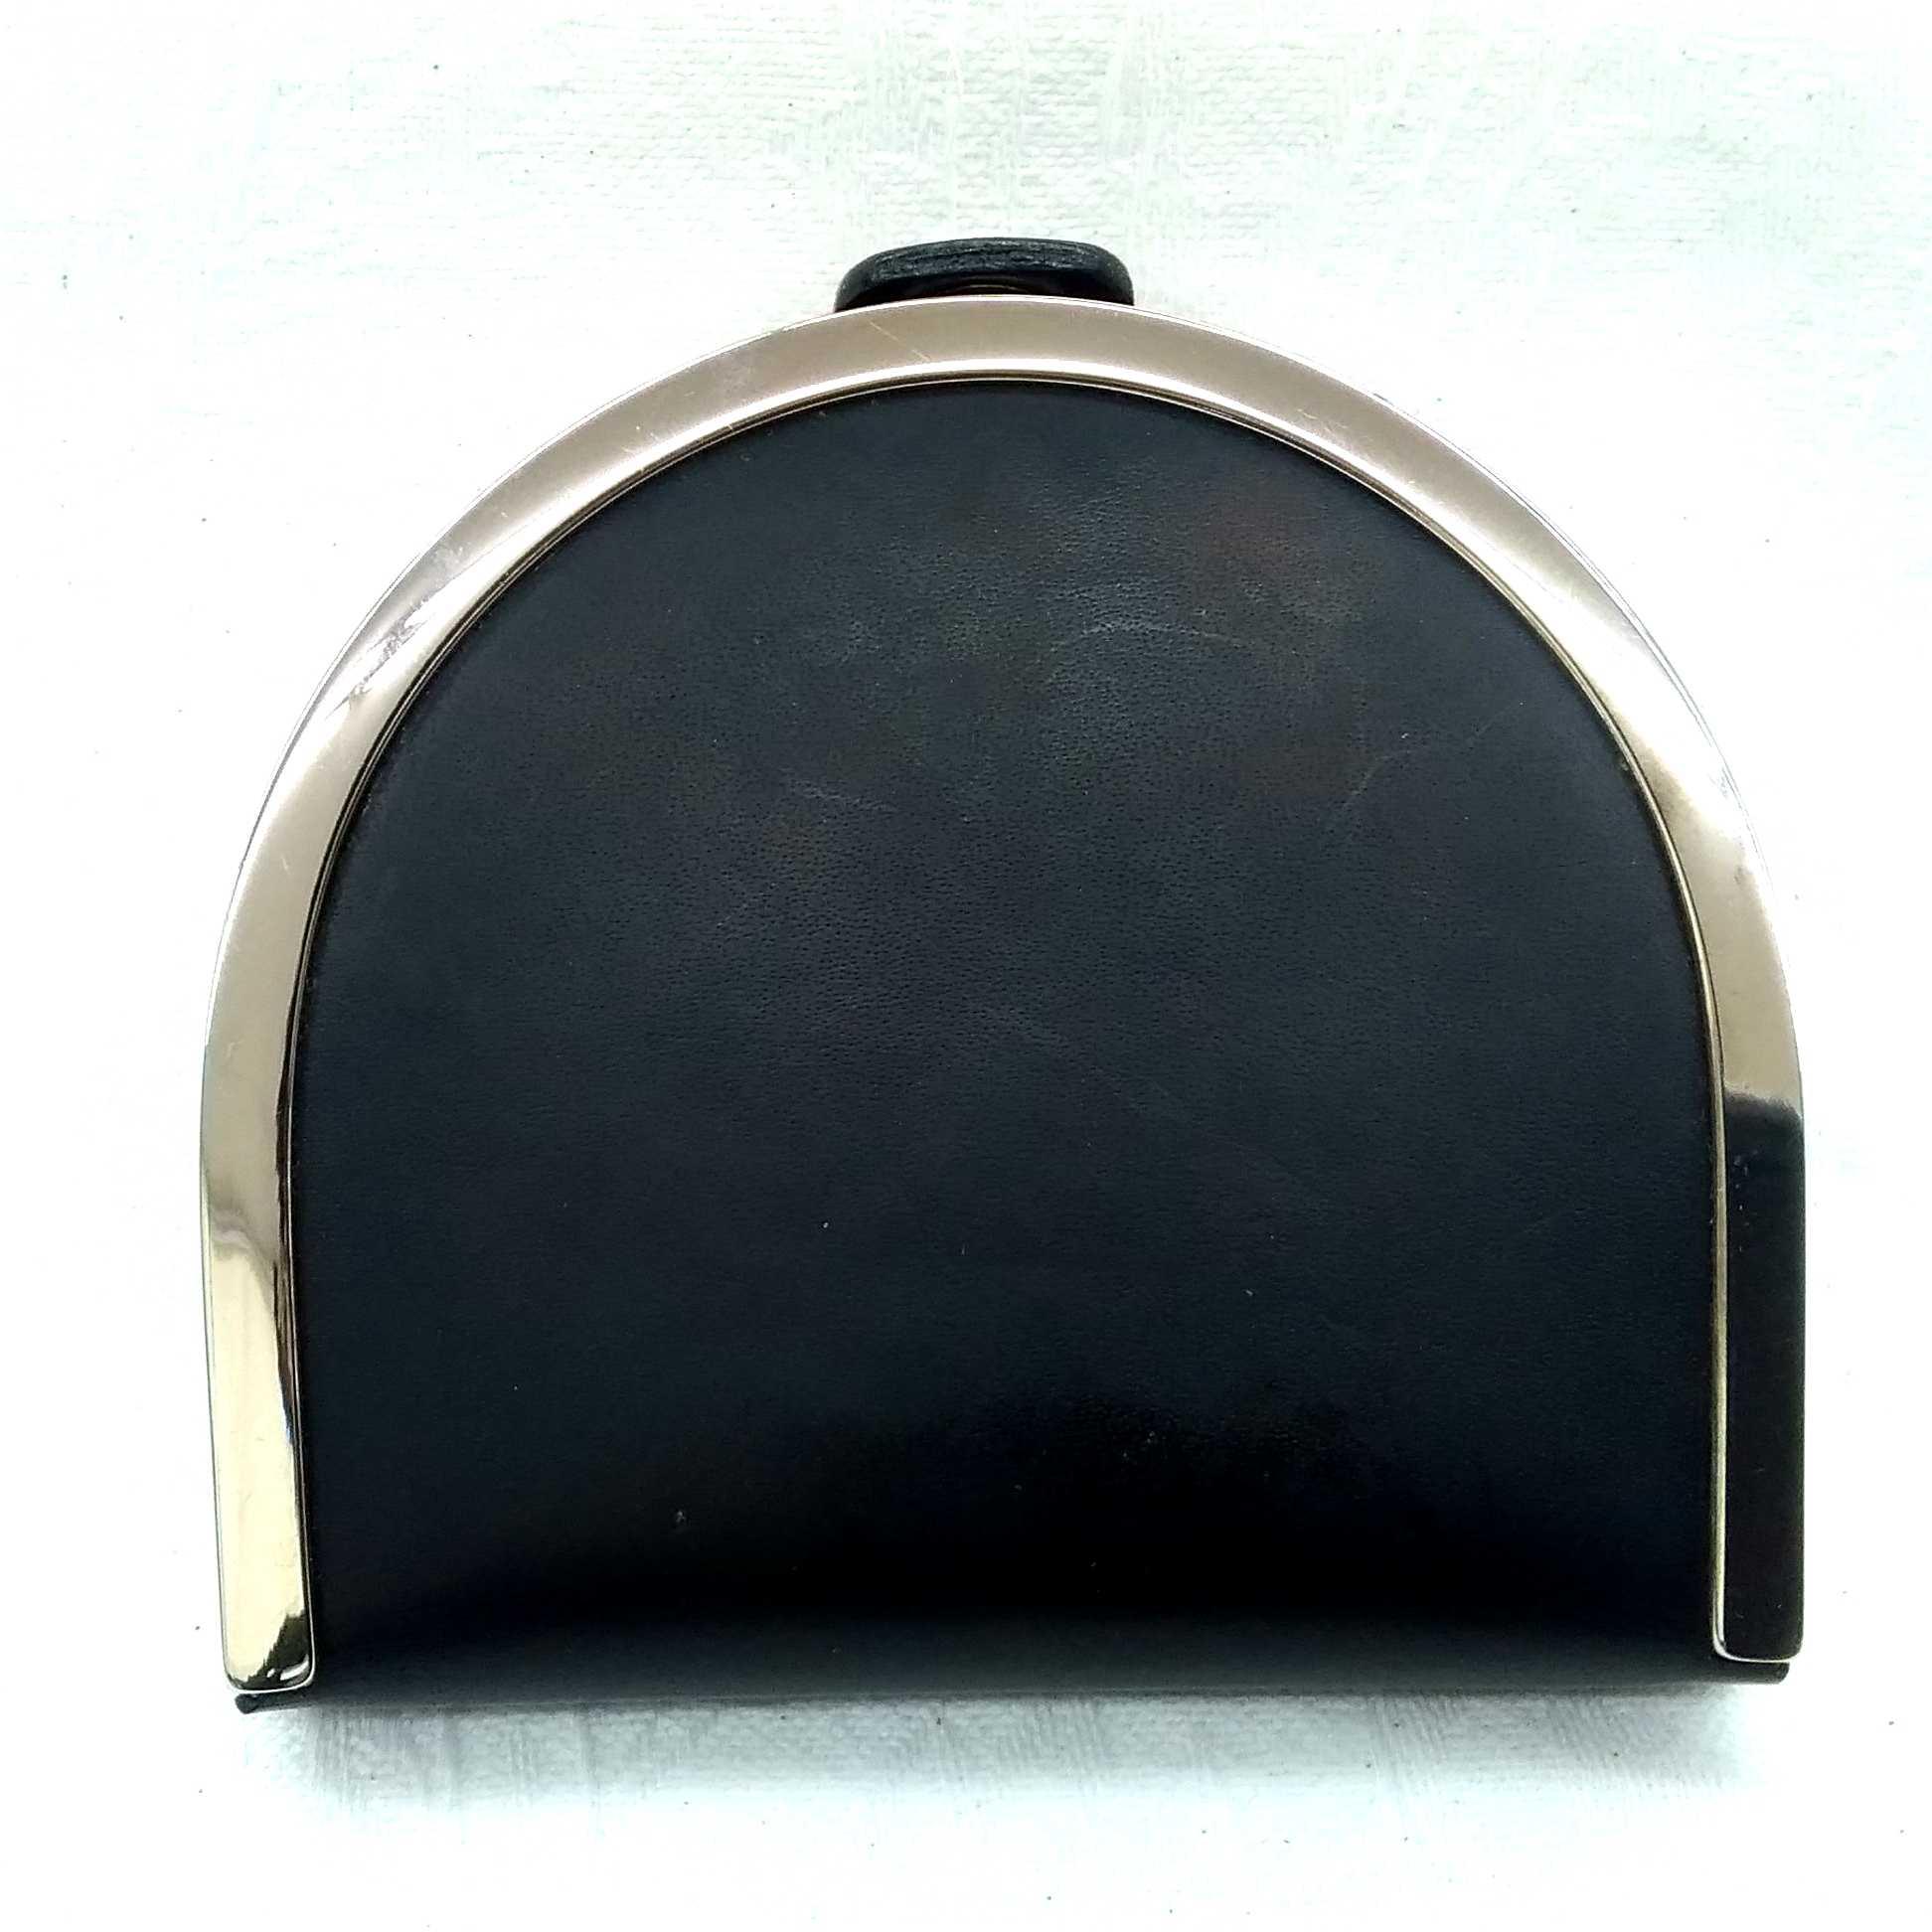 馬蹄型小銭入れ|SALVATORE FERRAGAMO